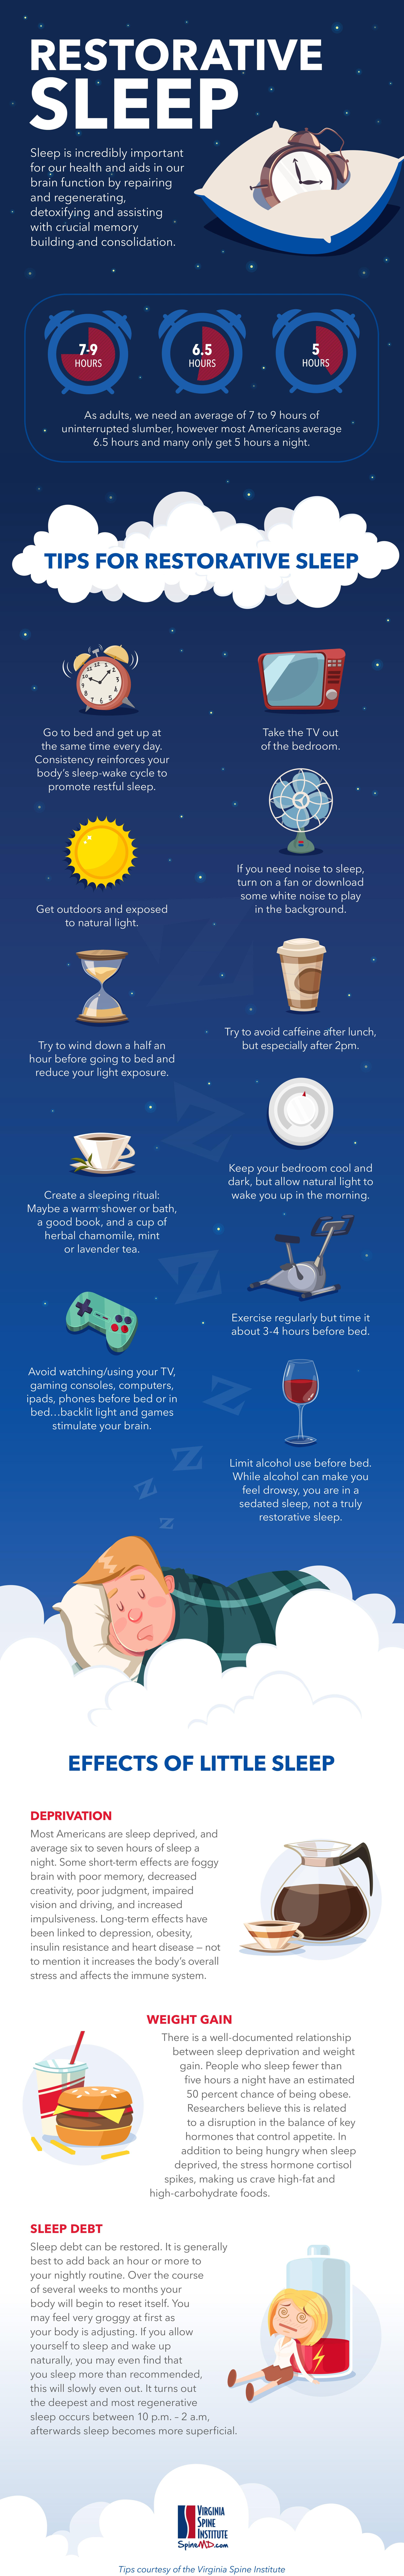 Restorative Sleep [Infographic]